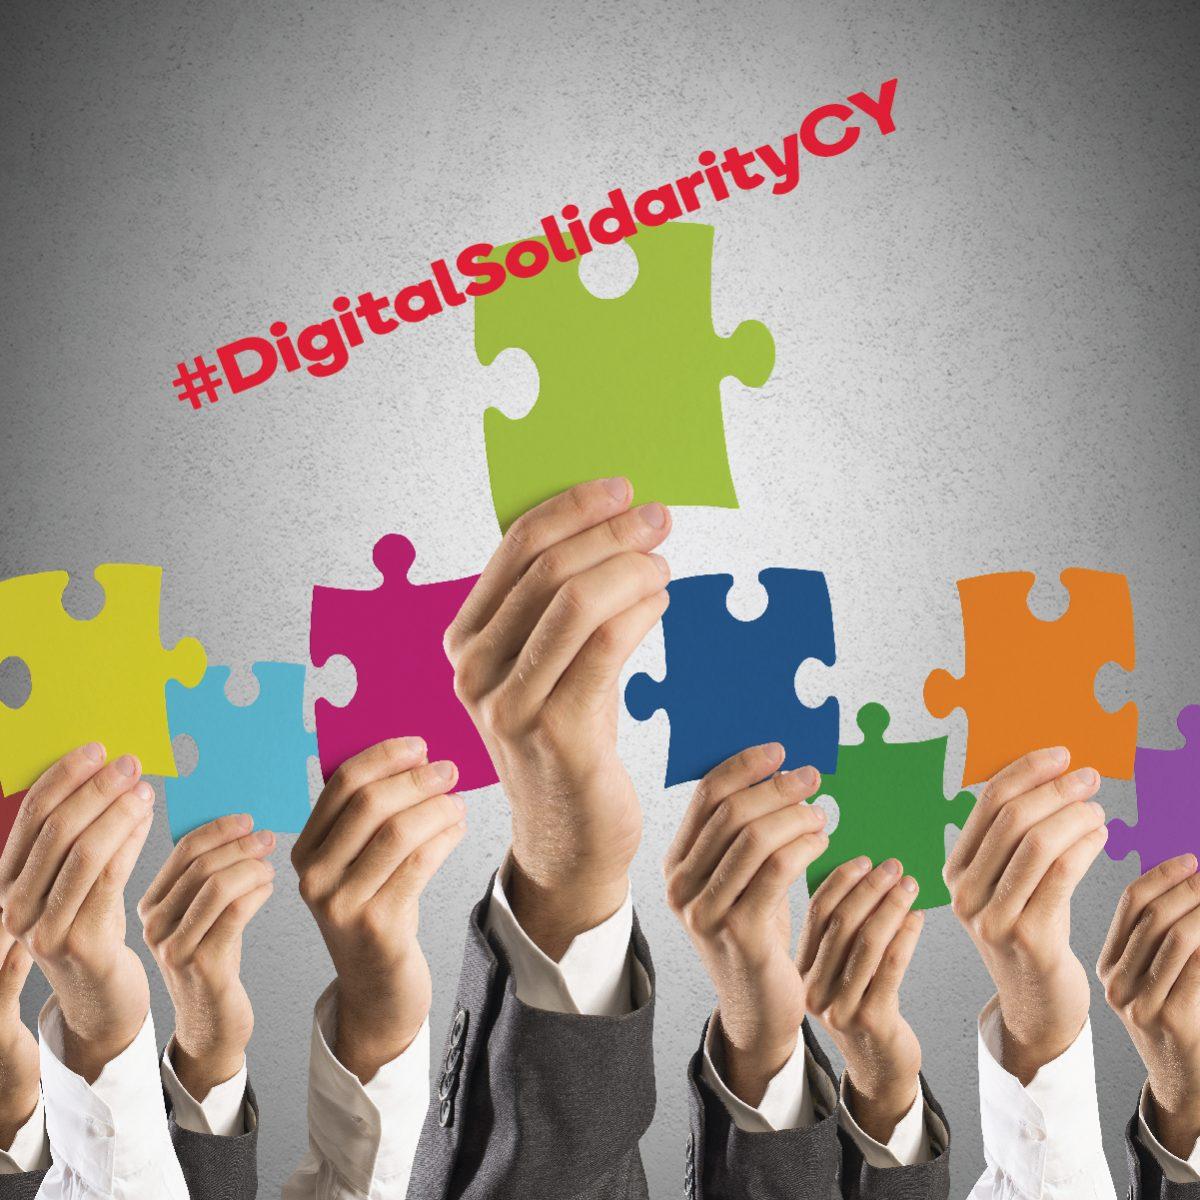 digital-solidarity-from-cl8